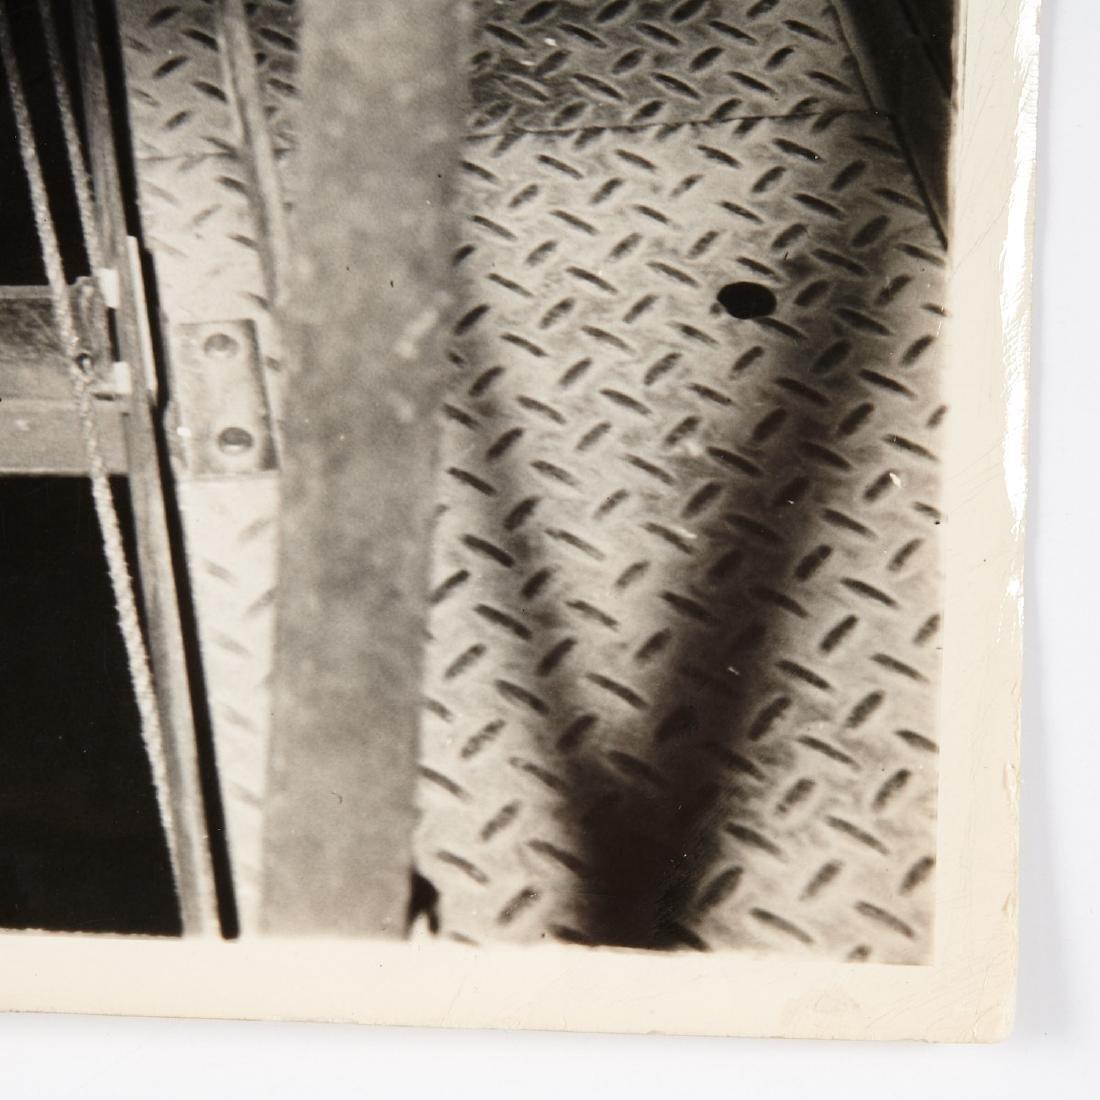 Weegee, photograph - 7